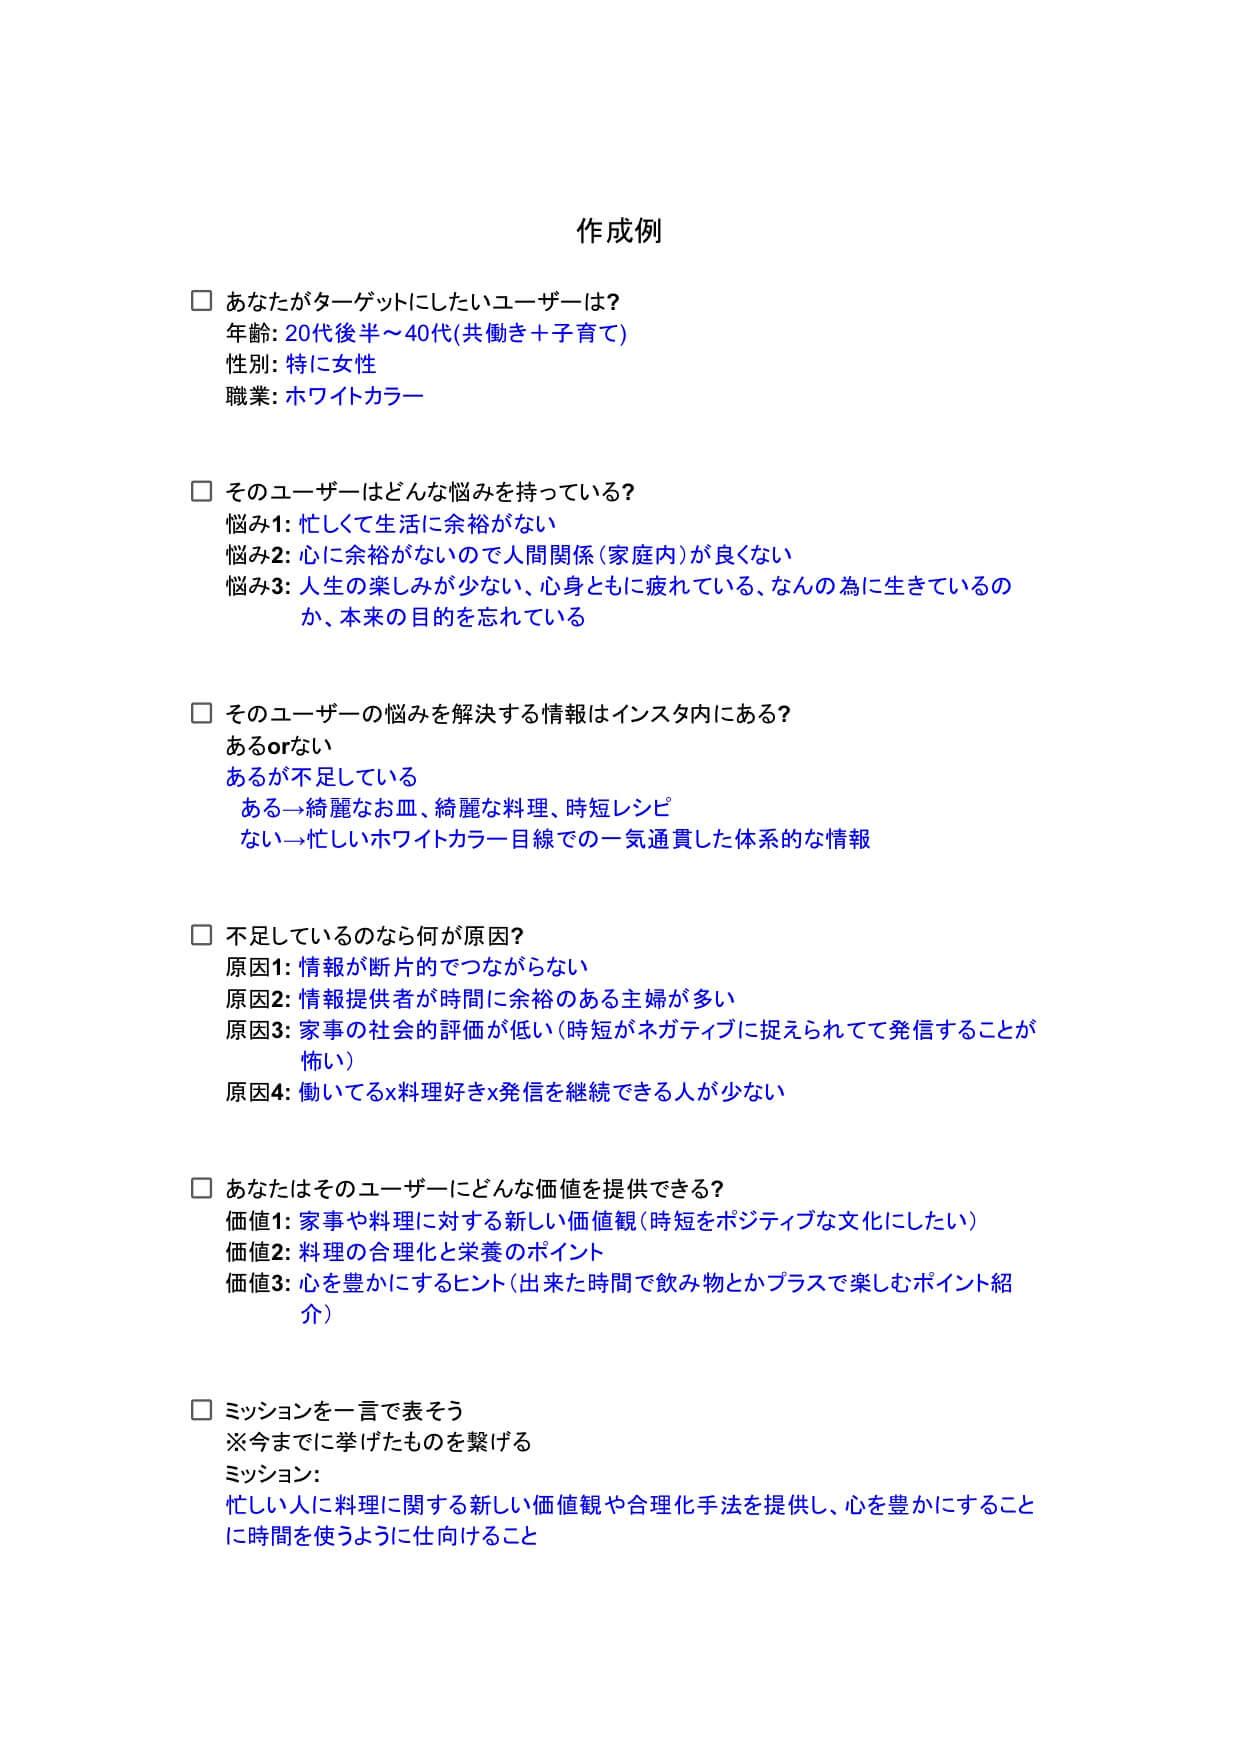 Instagramミッション策定シート2